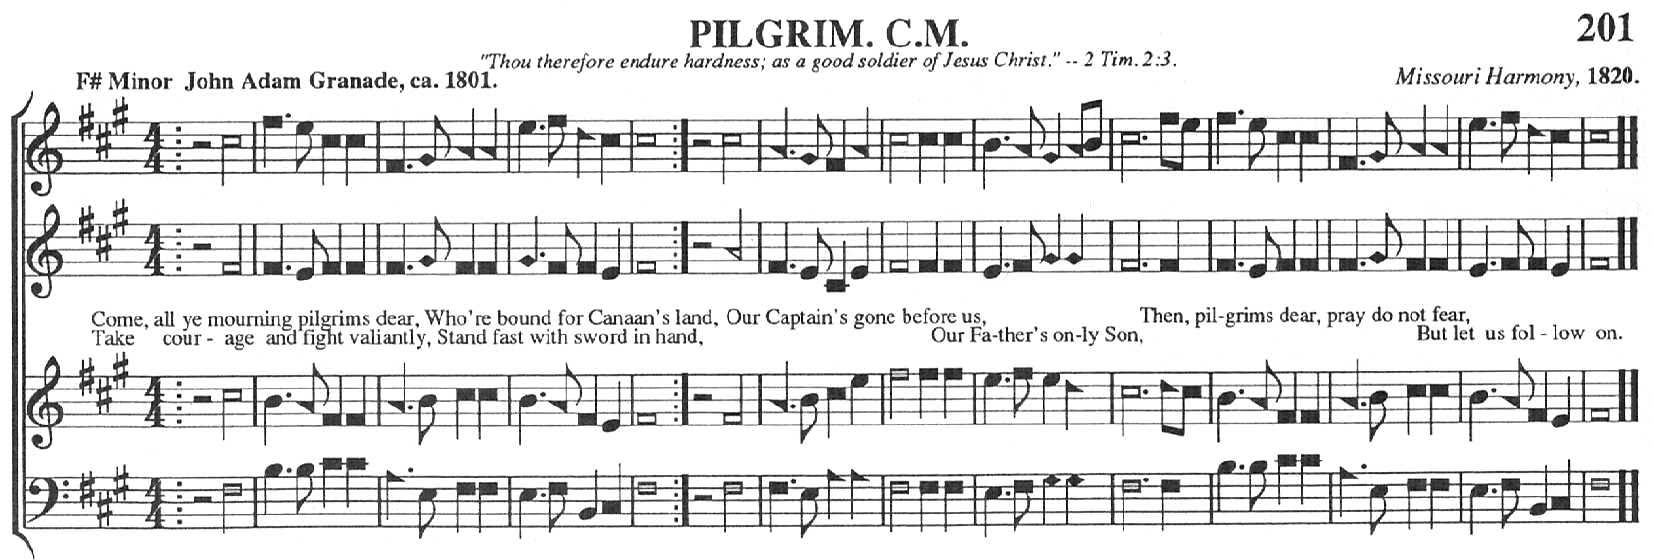 https://sites.google.com/a/sacredharpbremen.org/sacred-harp-bremen/ressourcen/201b-pilgrim/201%20Pilgrim.pdf